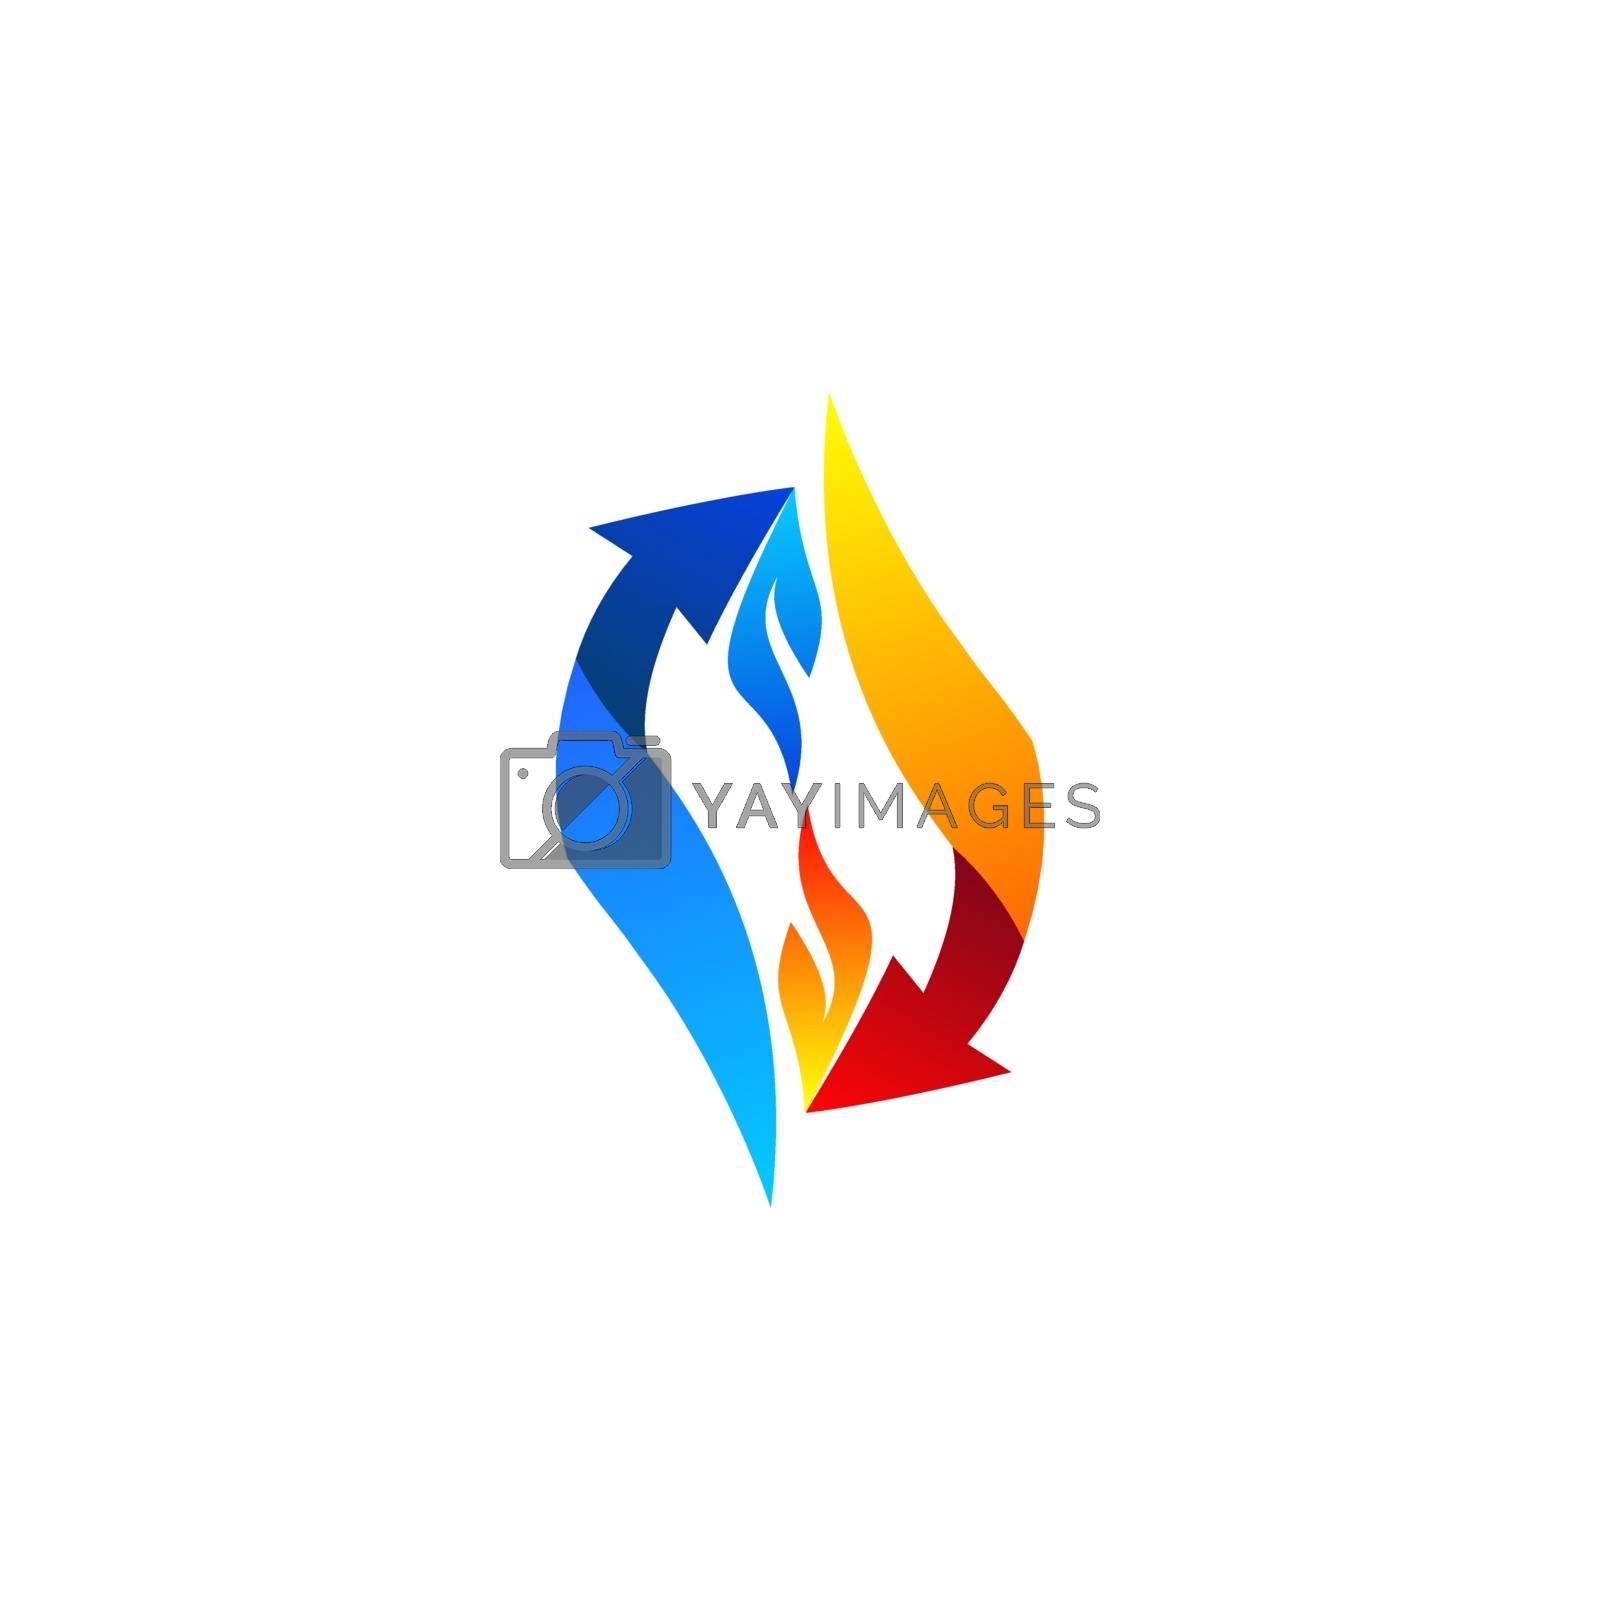 arrows flame connection logo concept elements symbol icon vector design illustration